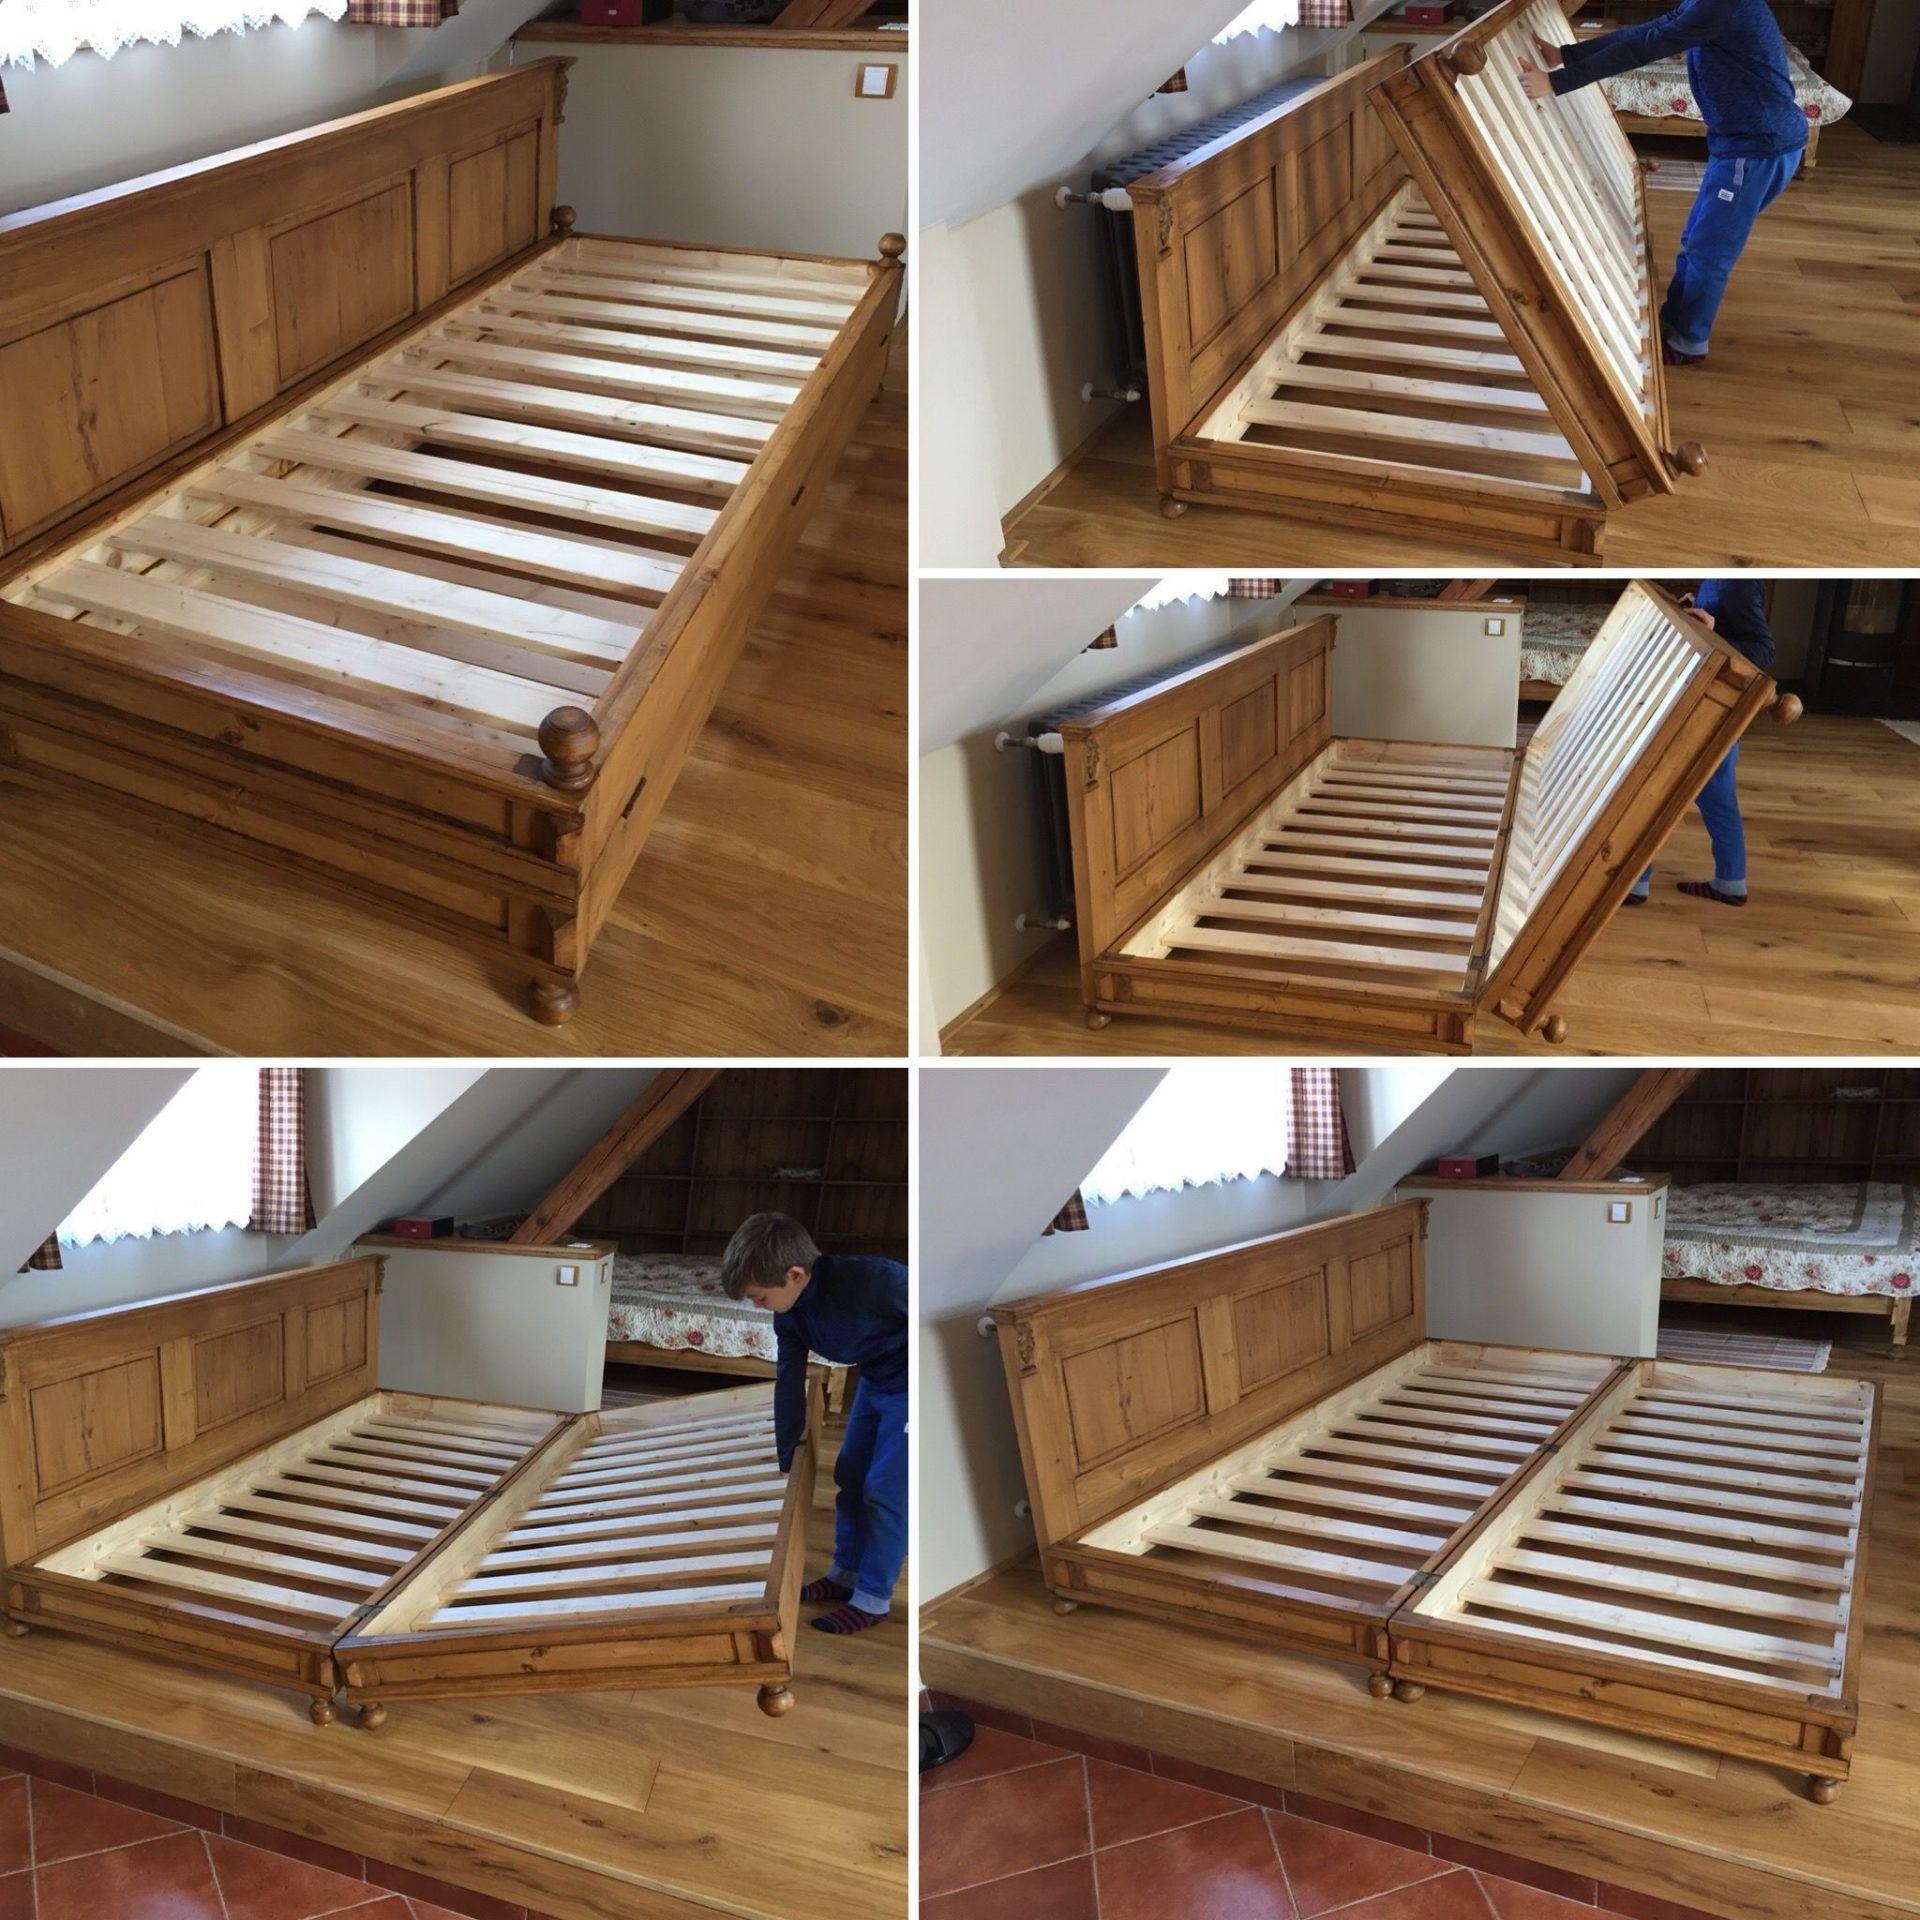 Murphy Bed Ideas Designs The Good Luck Duck In 2020 Diy Sofa Bed Diy Sofa Murphy Bed Diy